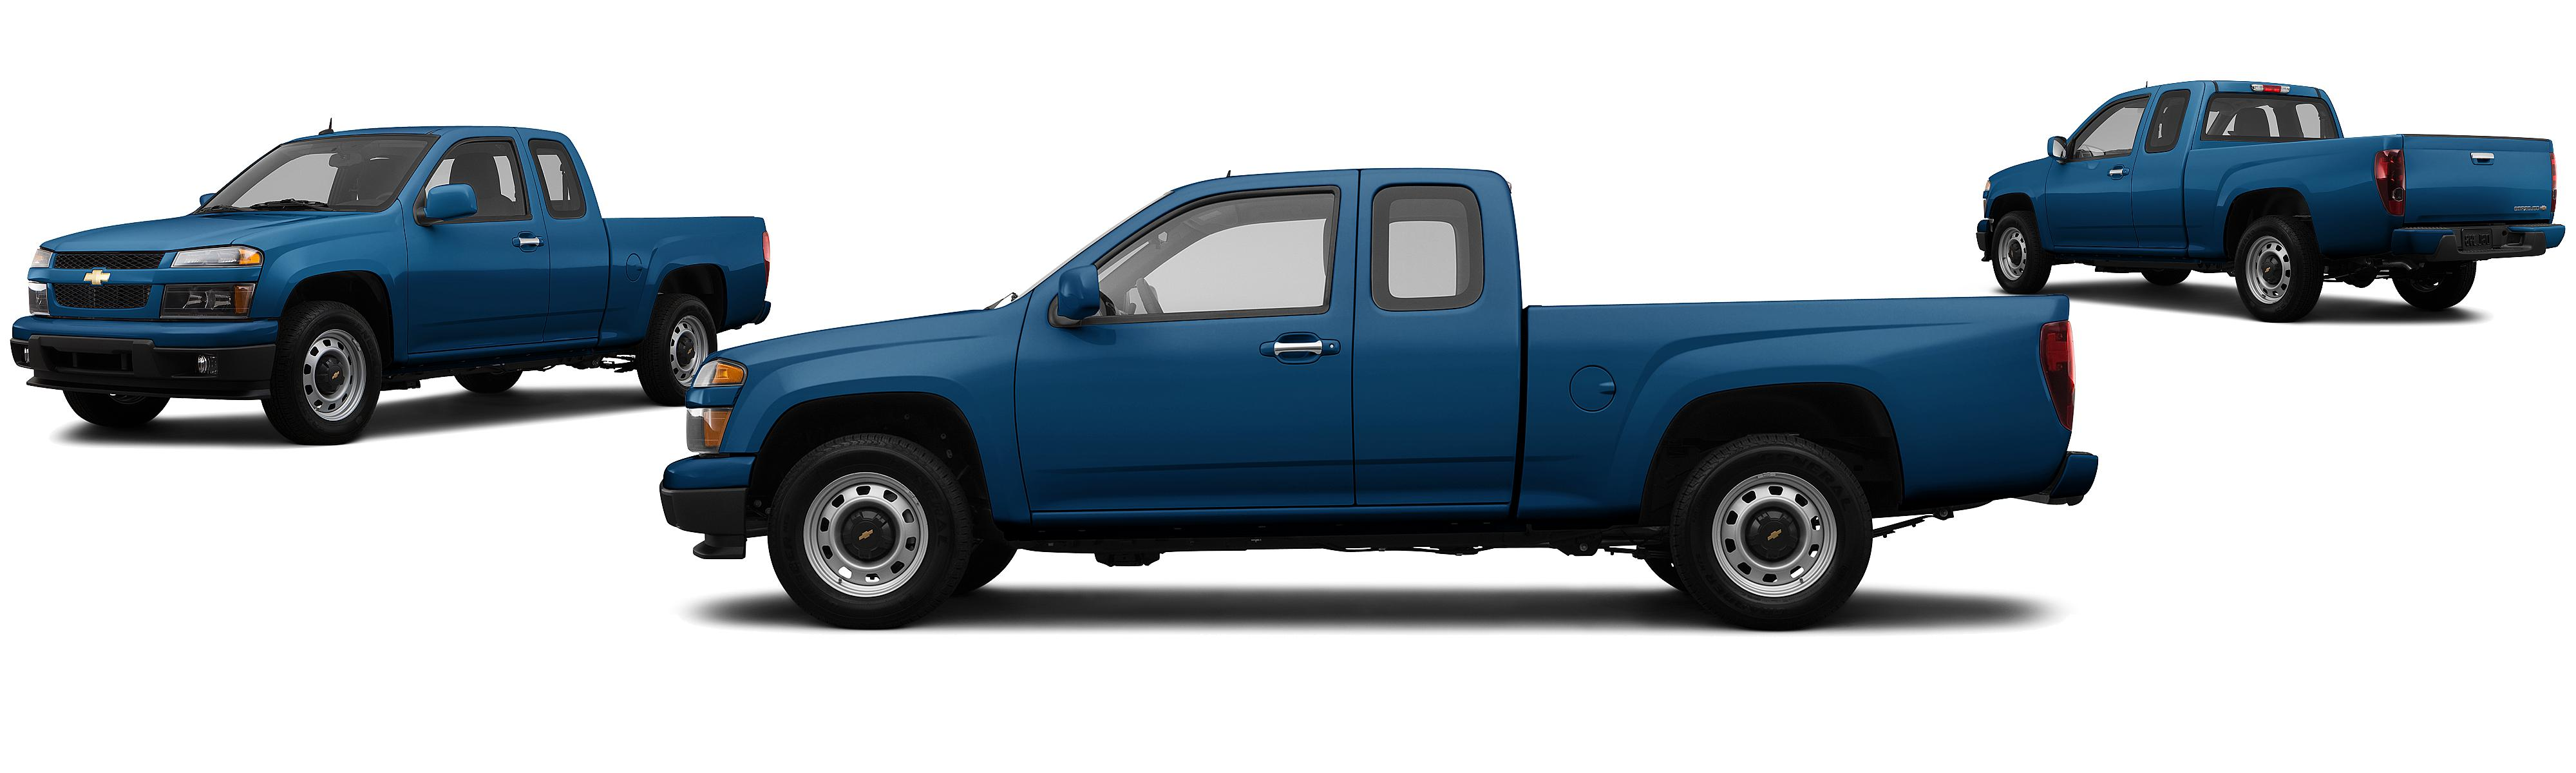 status truck astro available chevrolet dukes auto colorado sales work body